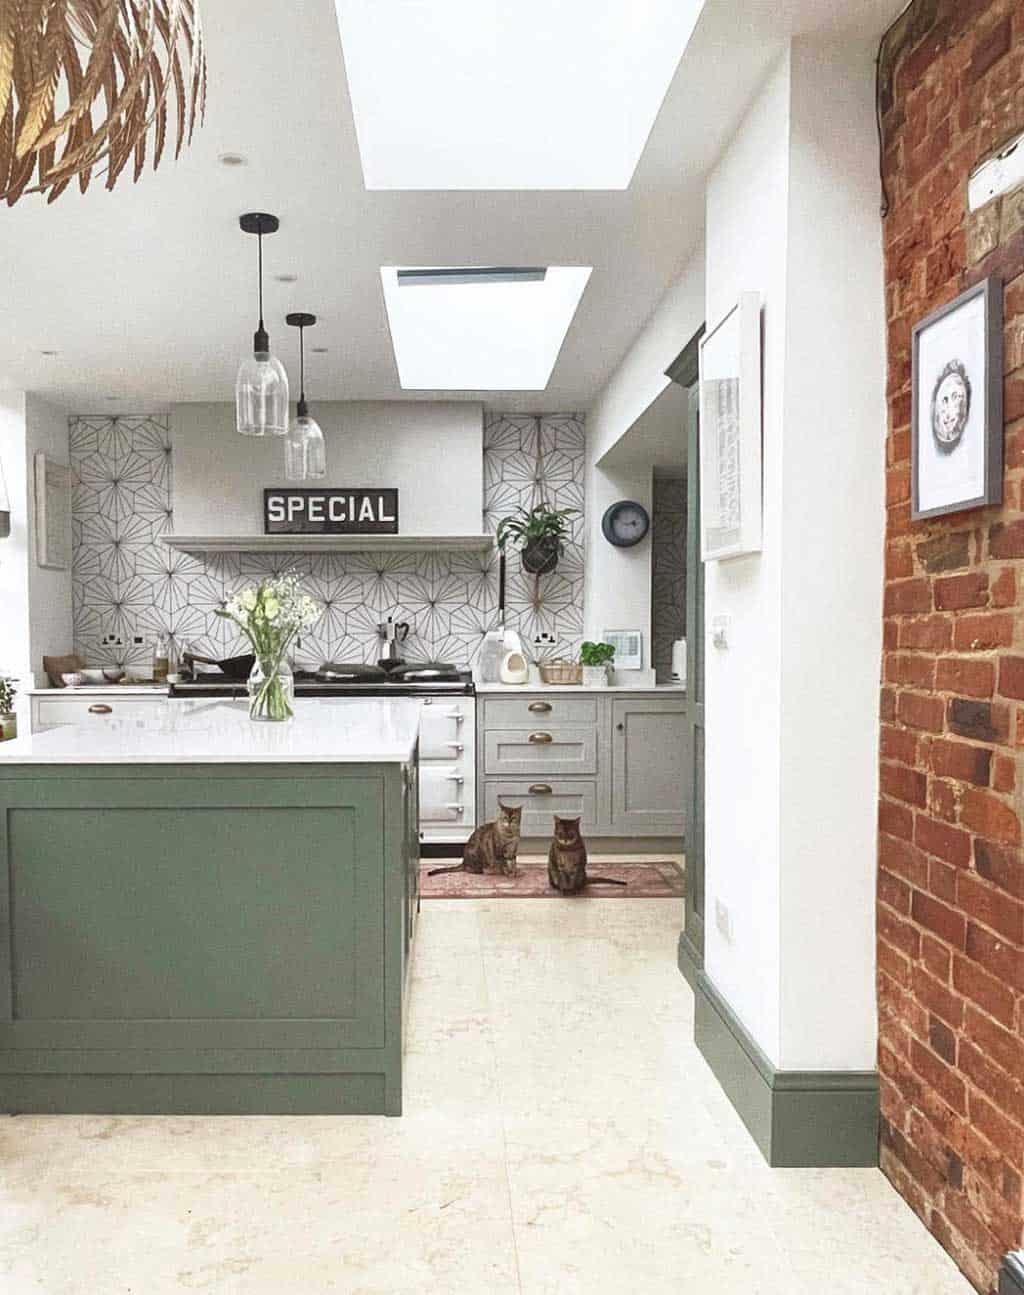 limestone floor, lilypad tiles, green shaker kitchen, grey shaker kitchen